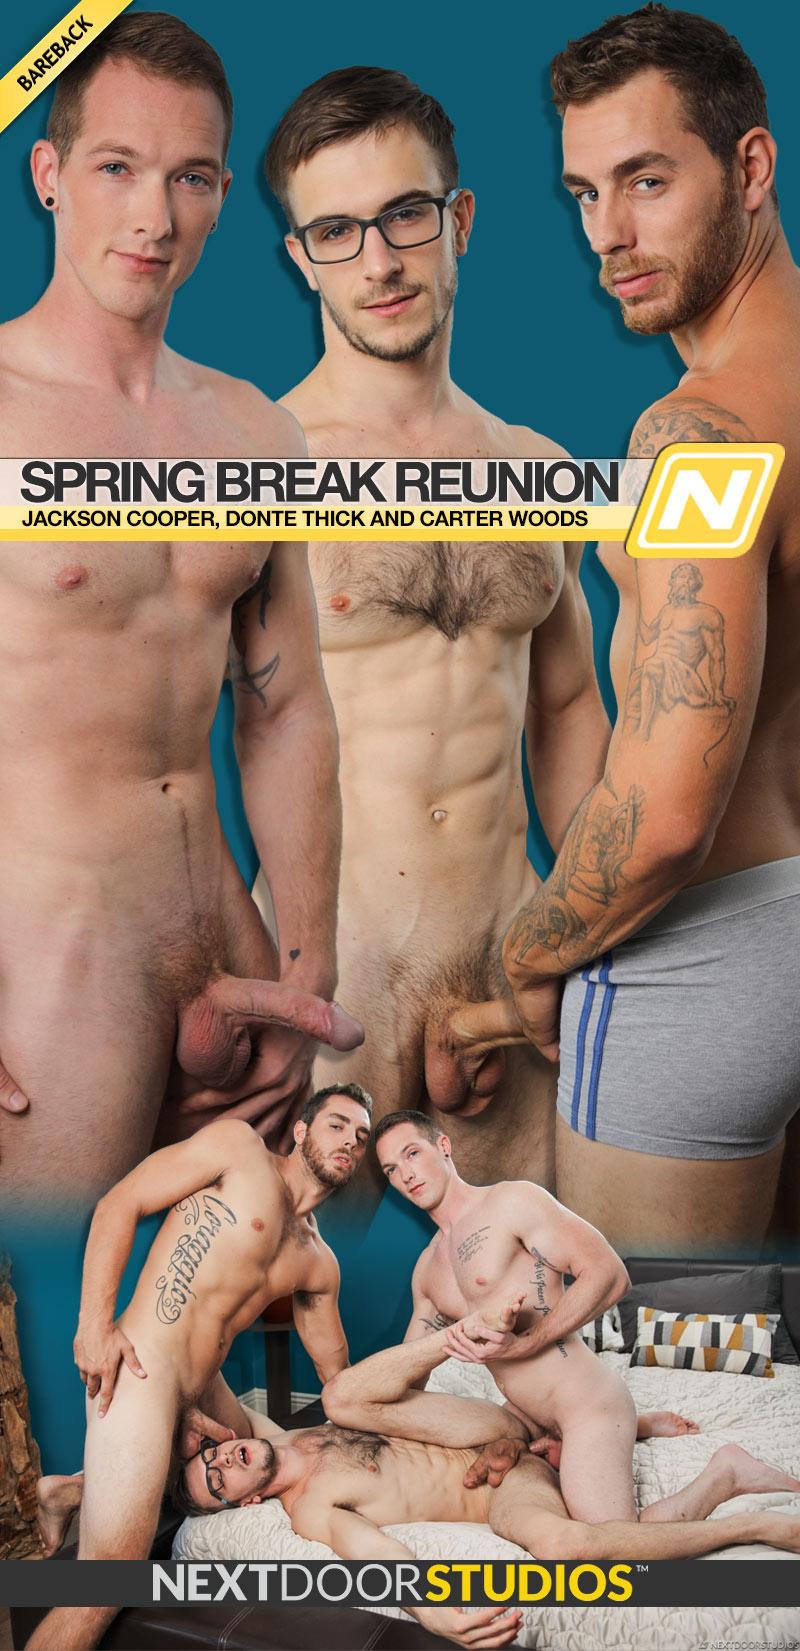 Spring Break Reunion (Jackson Cooper, Donte Thick and Carter Woods) (Bareback) at Next Door Studios